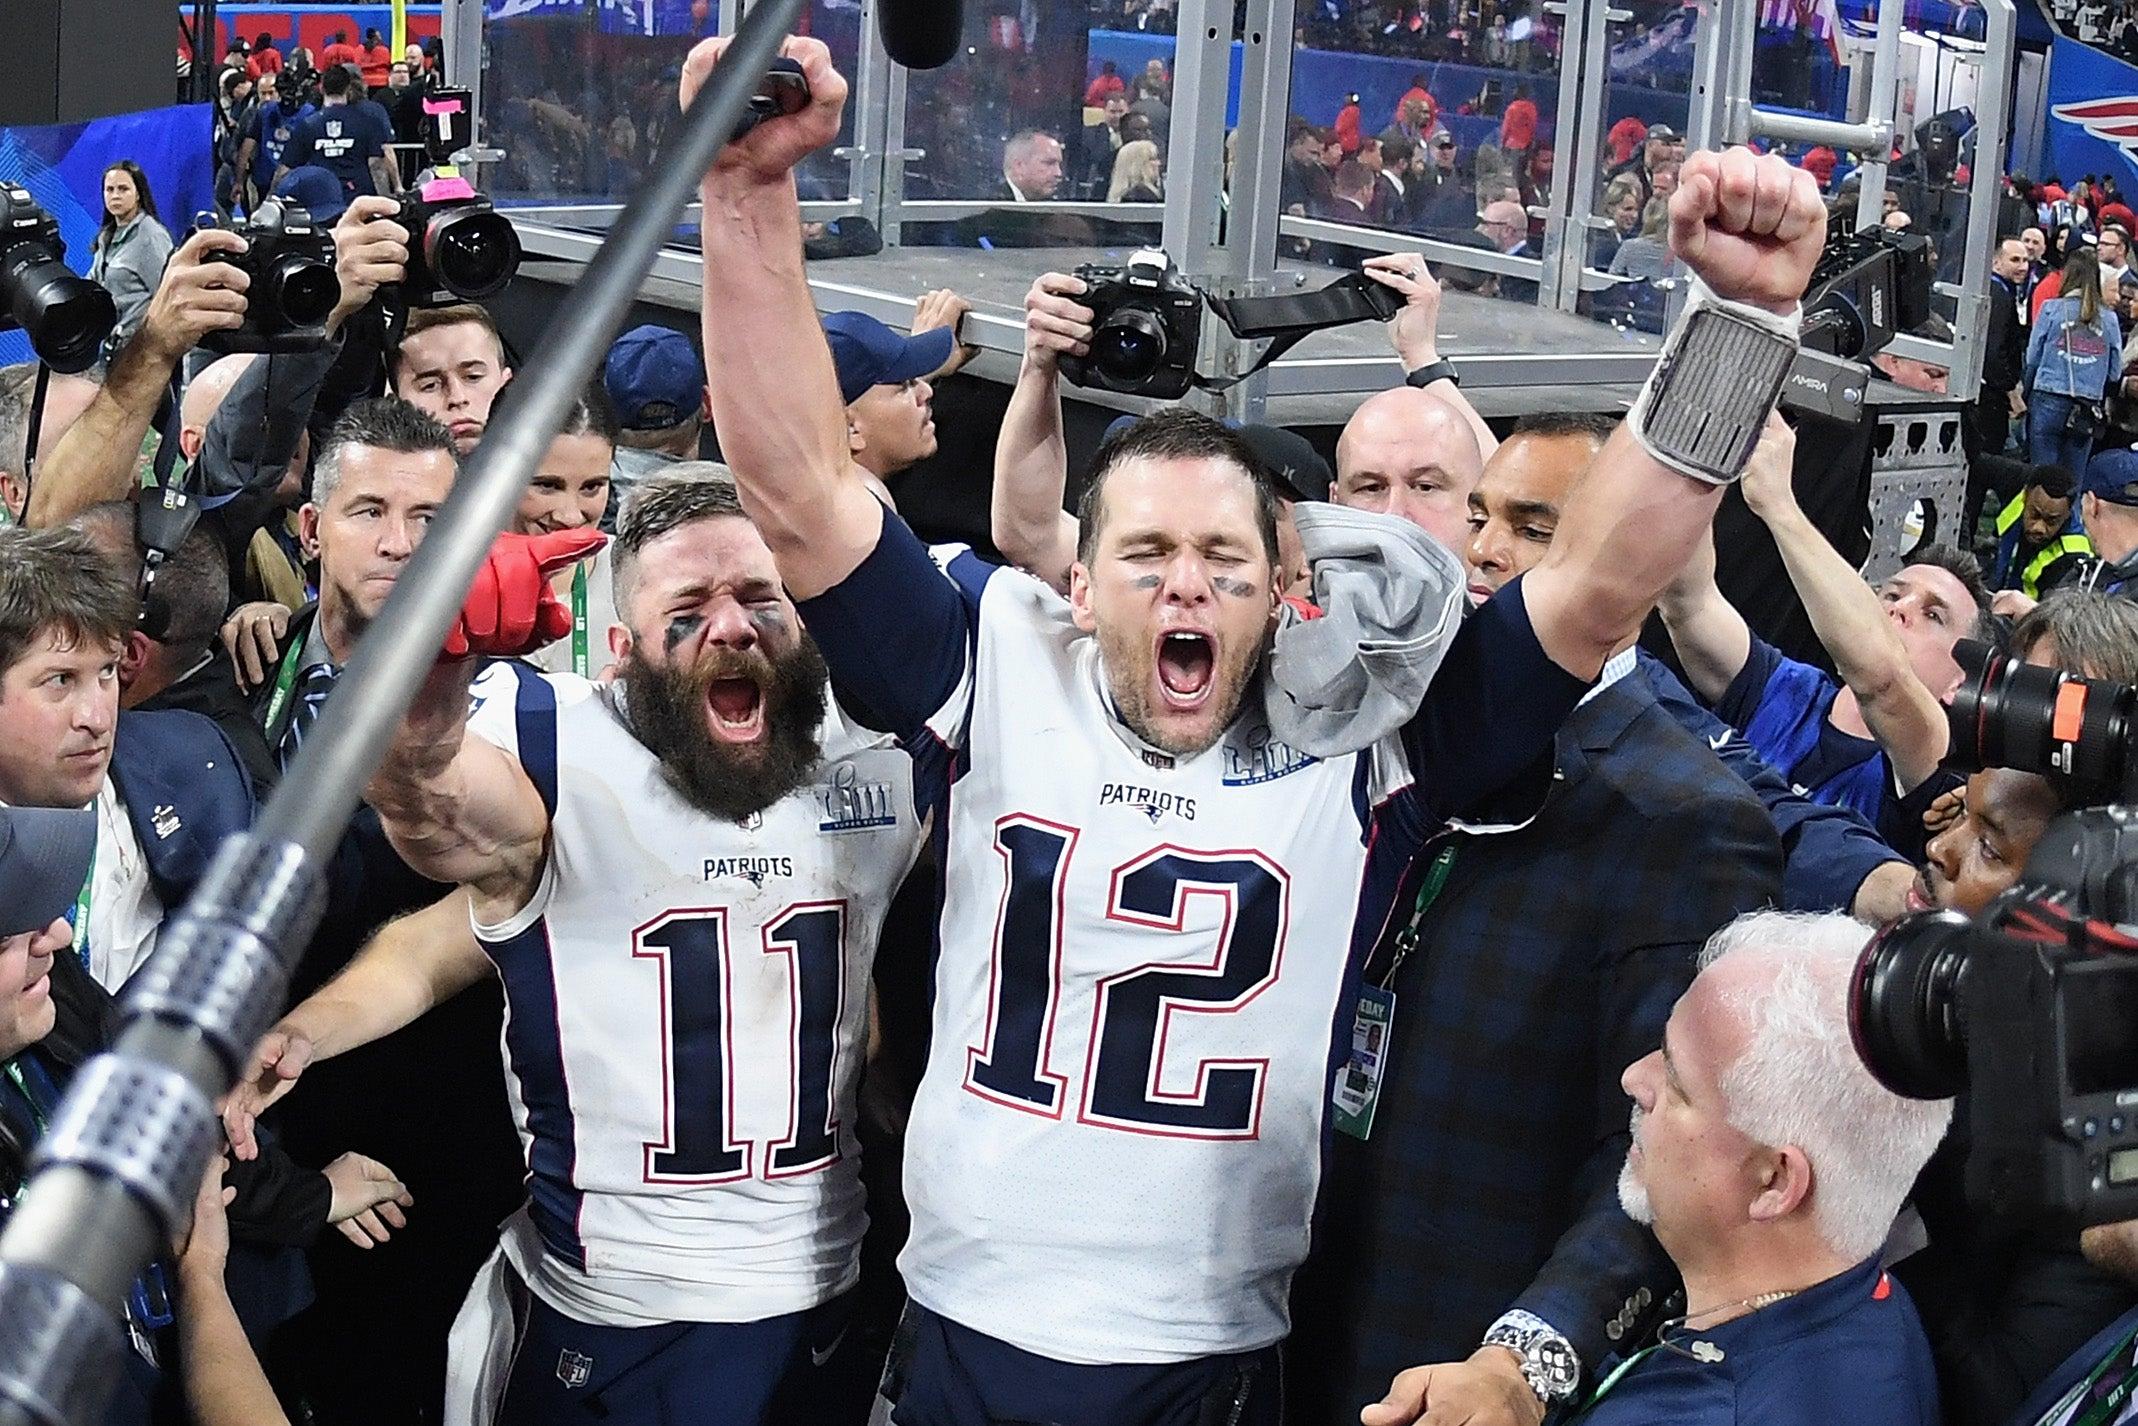 Tom Brady celebrating a Super Bowl win